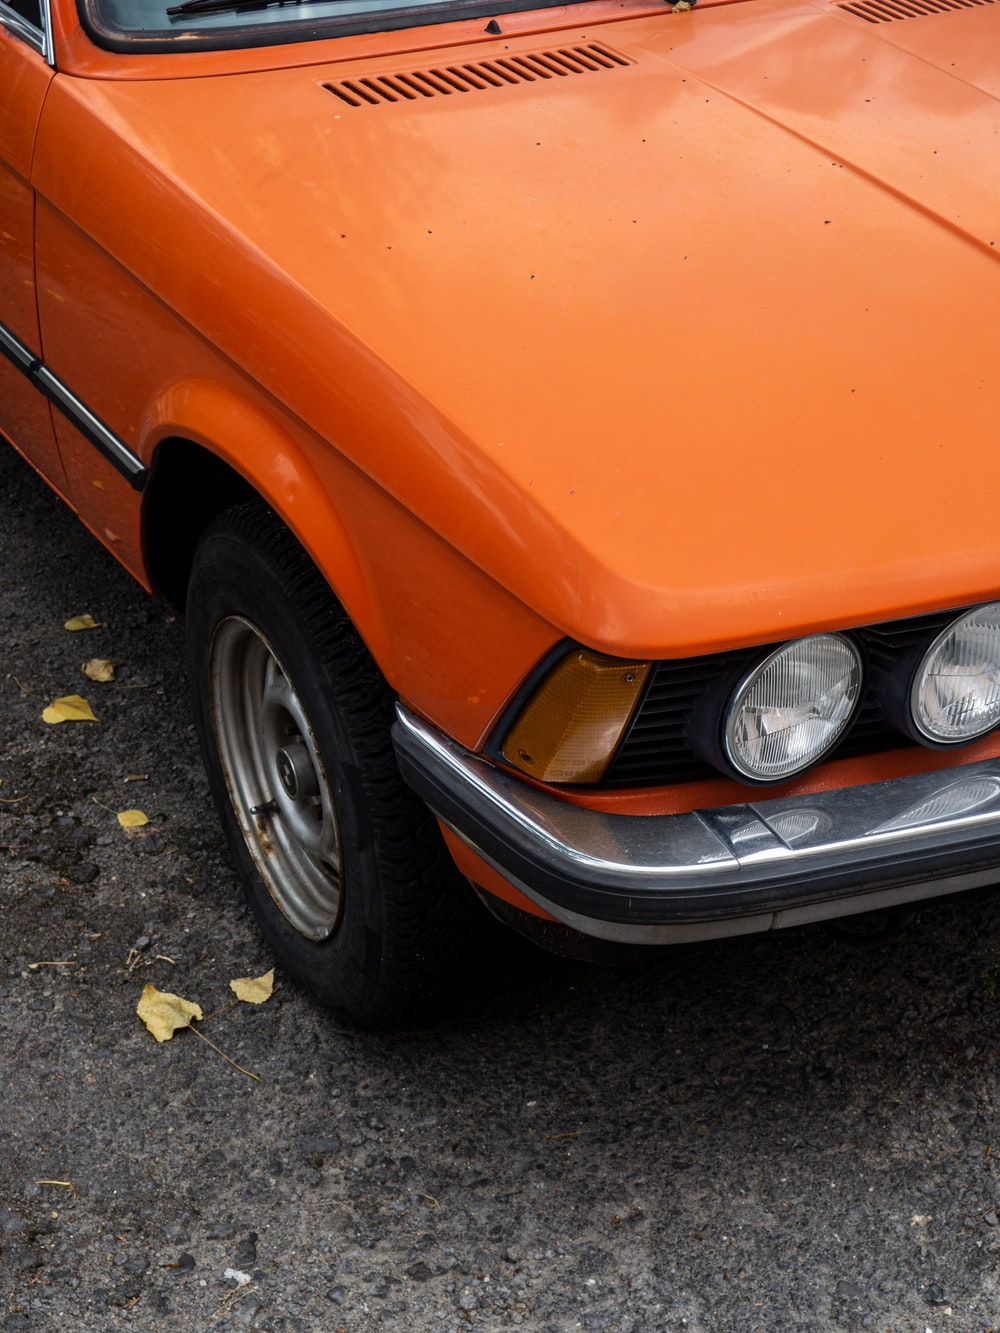 orange car on gray concrete pavement